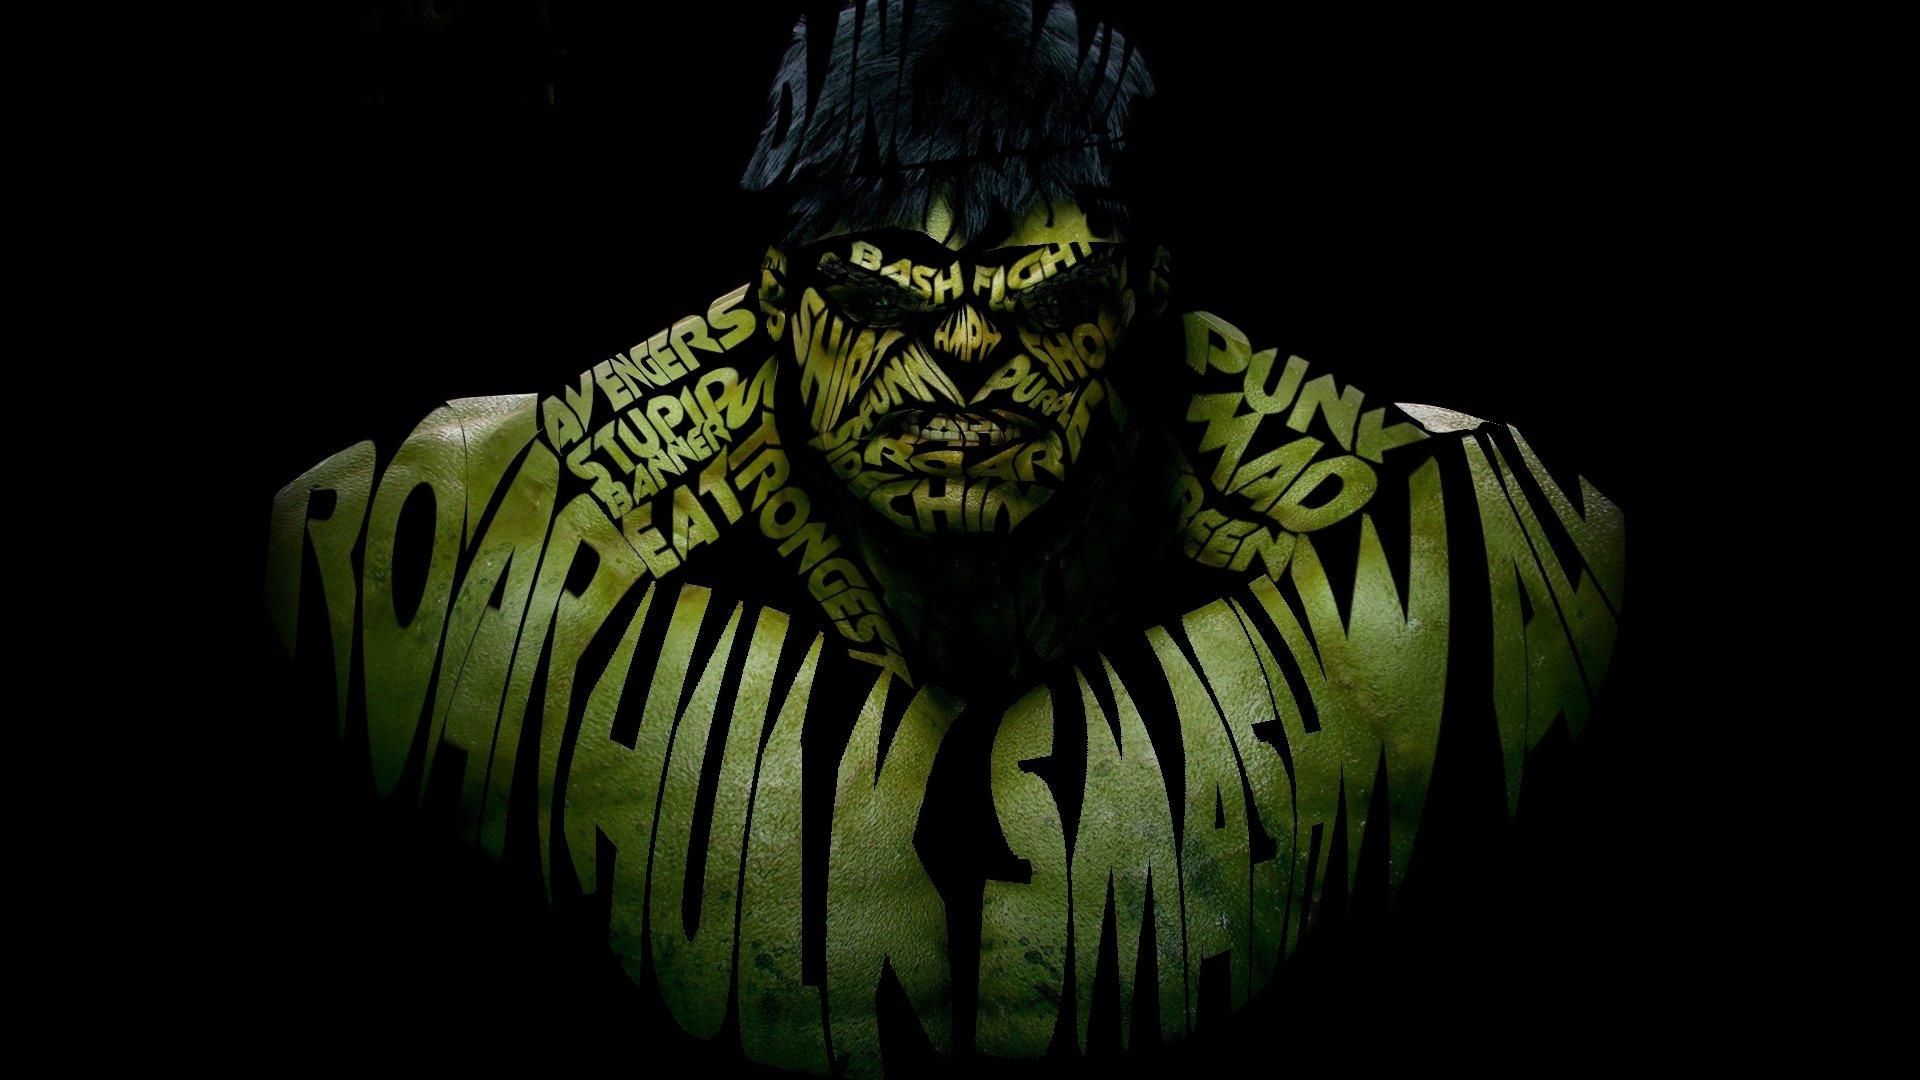 Hulk HD Wallpaper | Background Image | 1920x1080 | ID ...